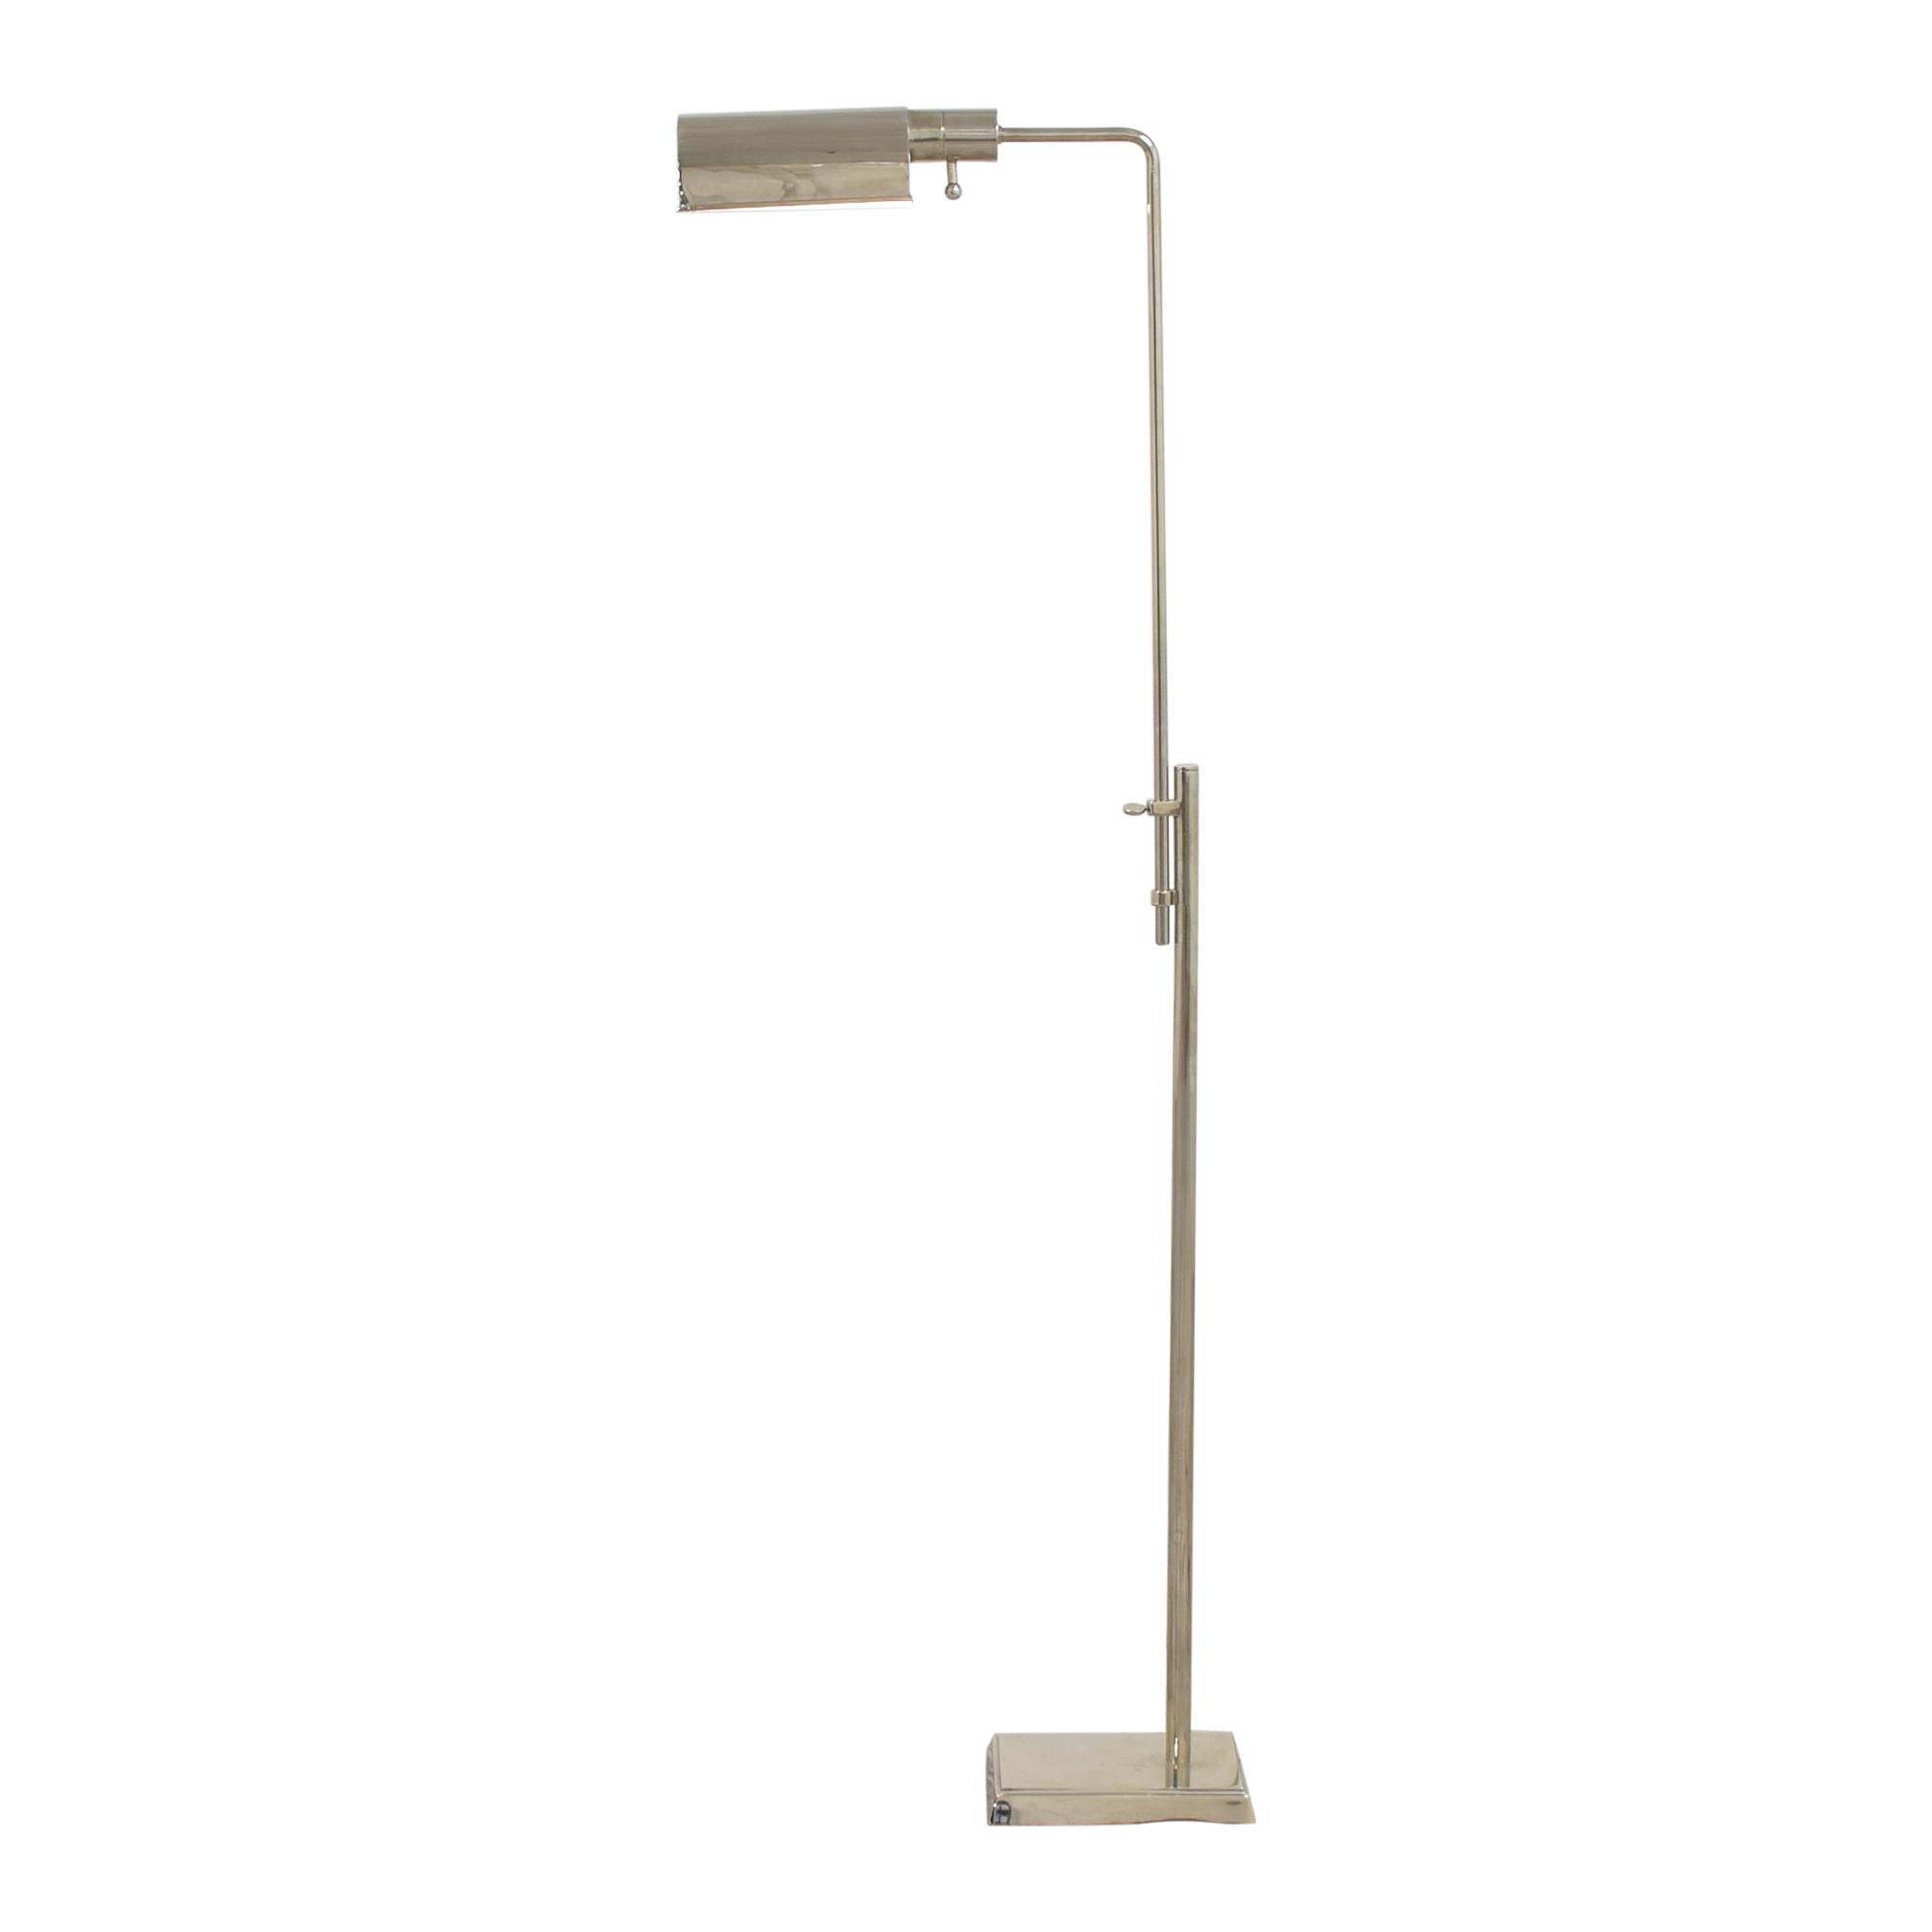 Burke Decor Burke Decor Pask Pharmacy Floor Lamp dimensions